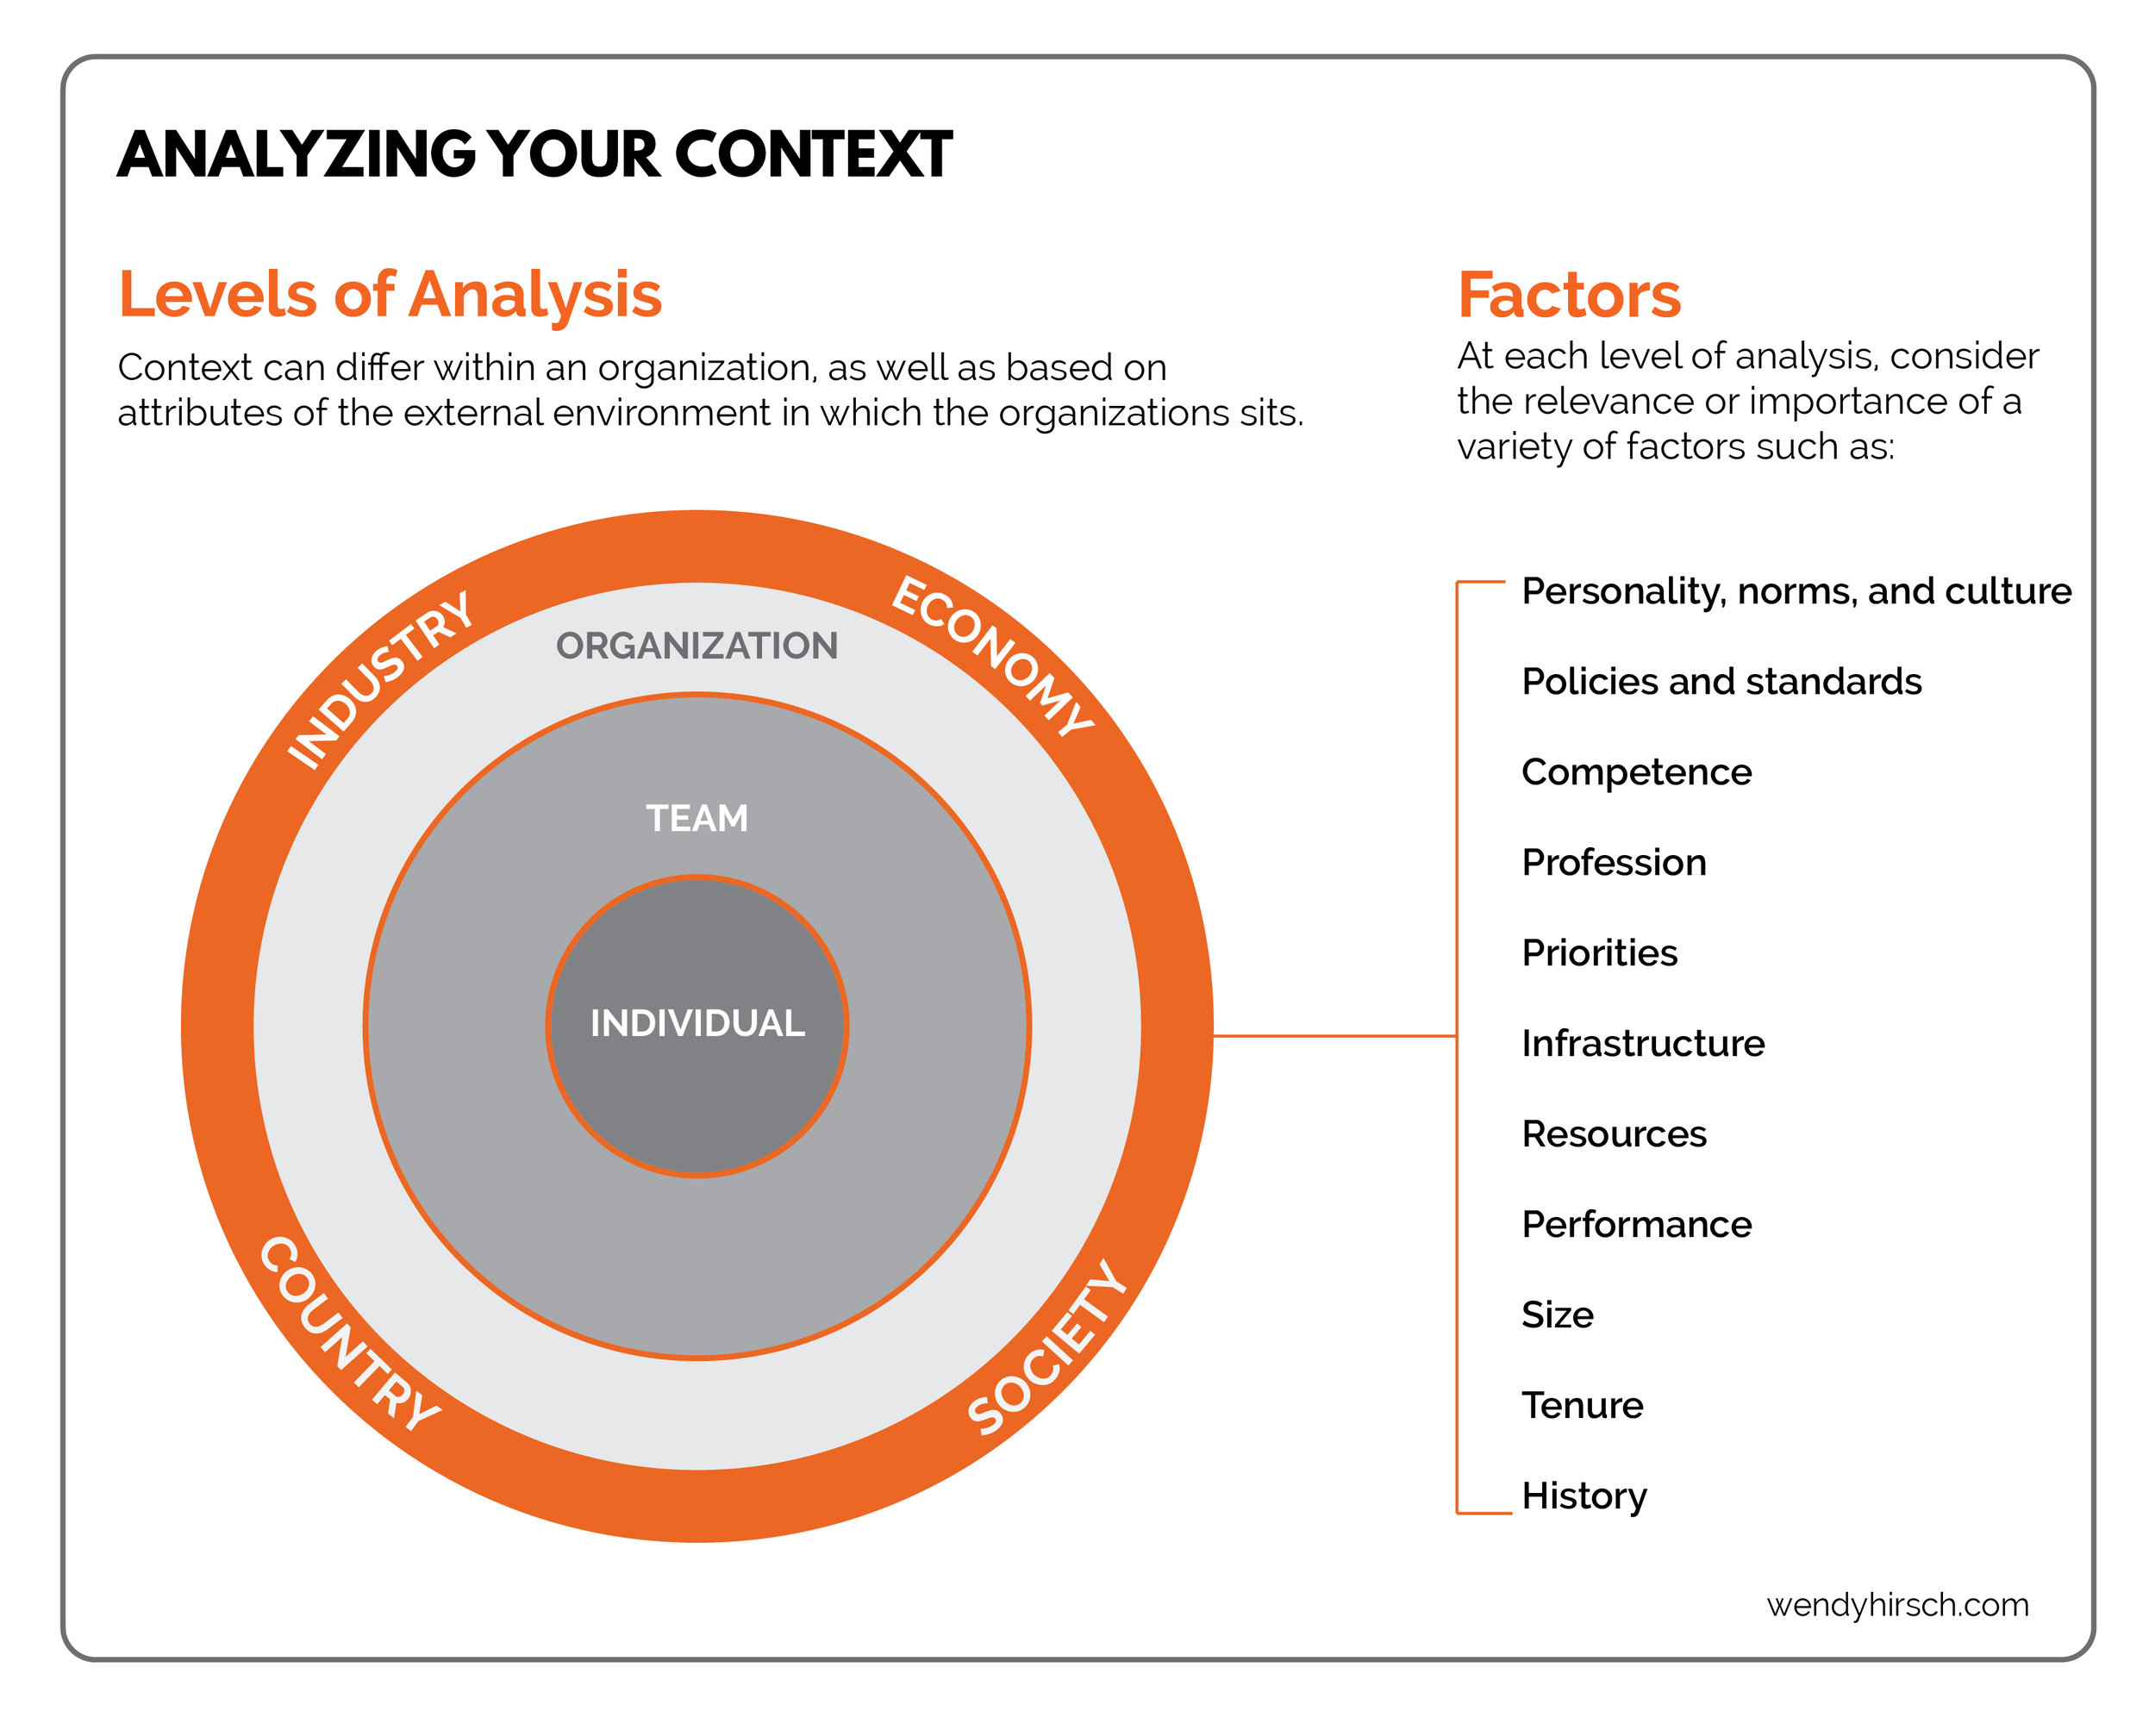 analyzing-context-300.jpg